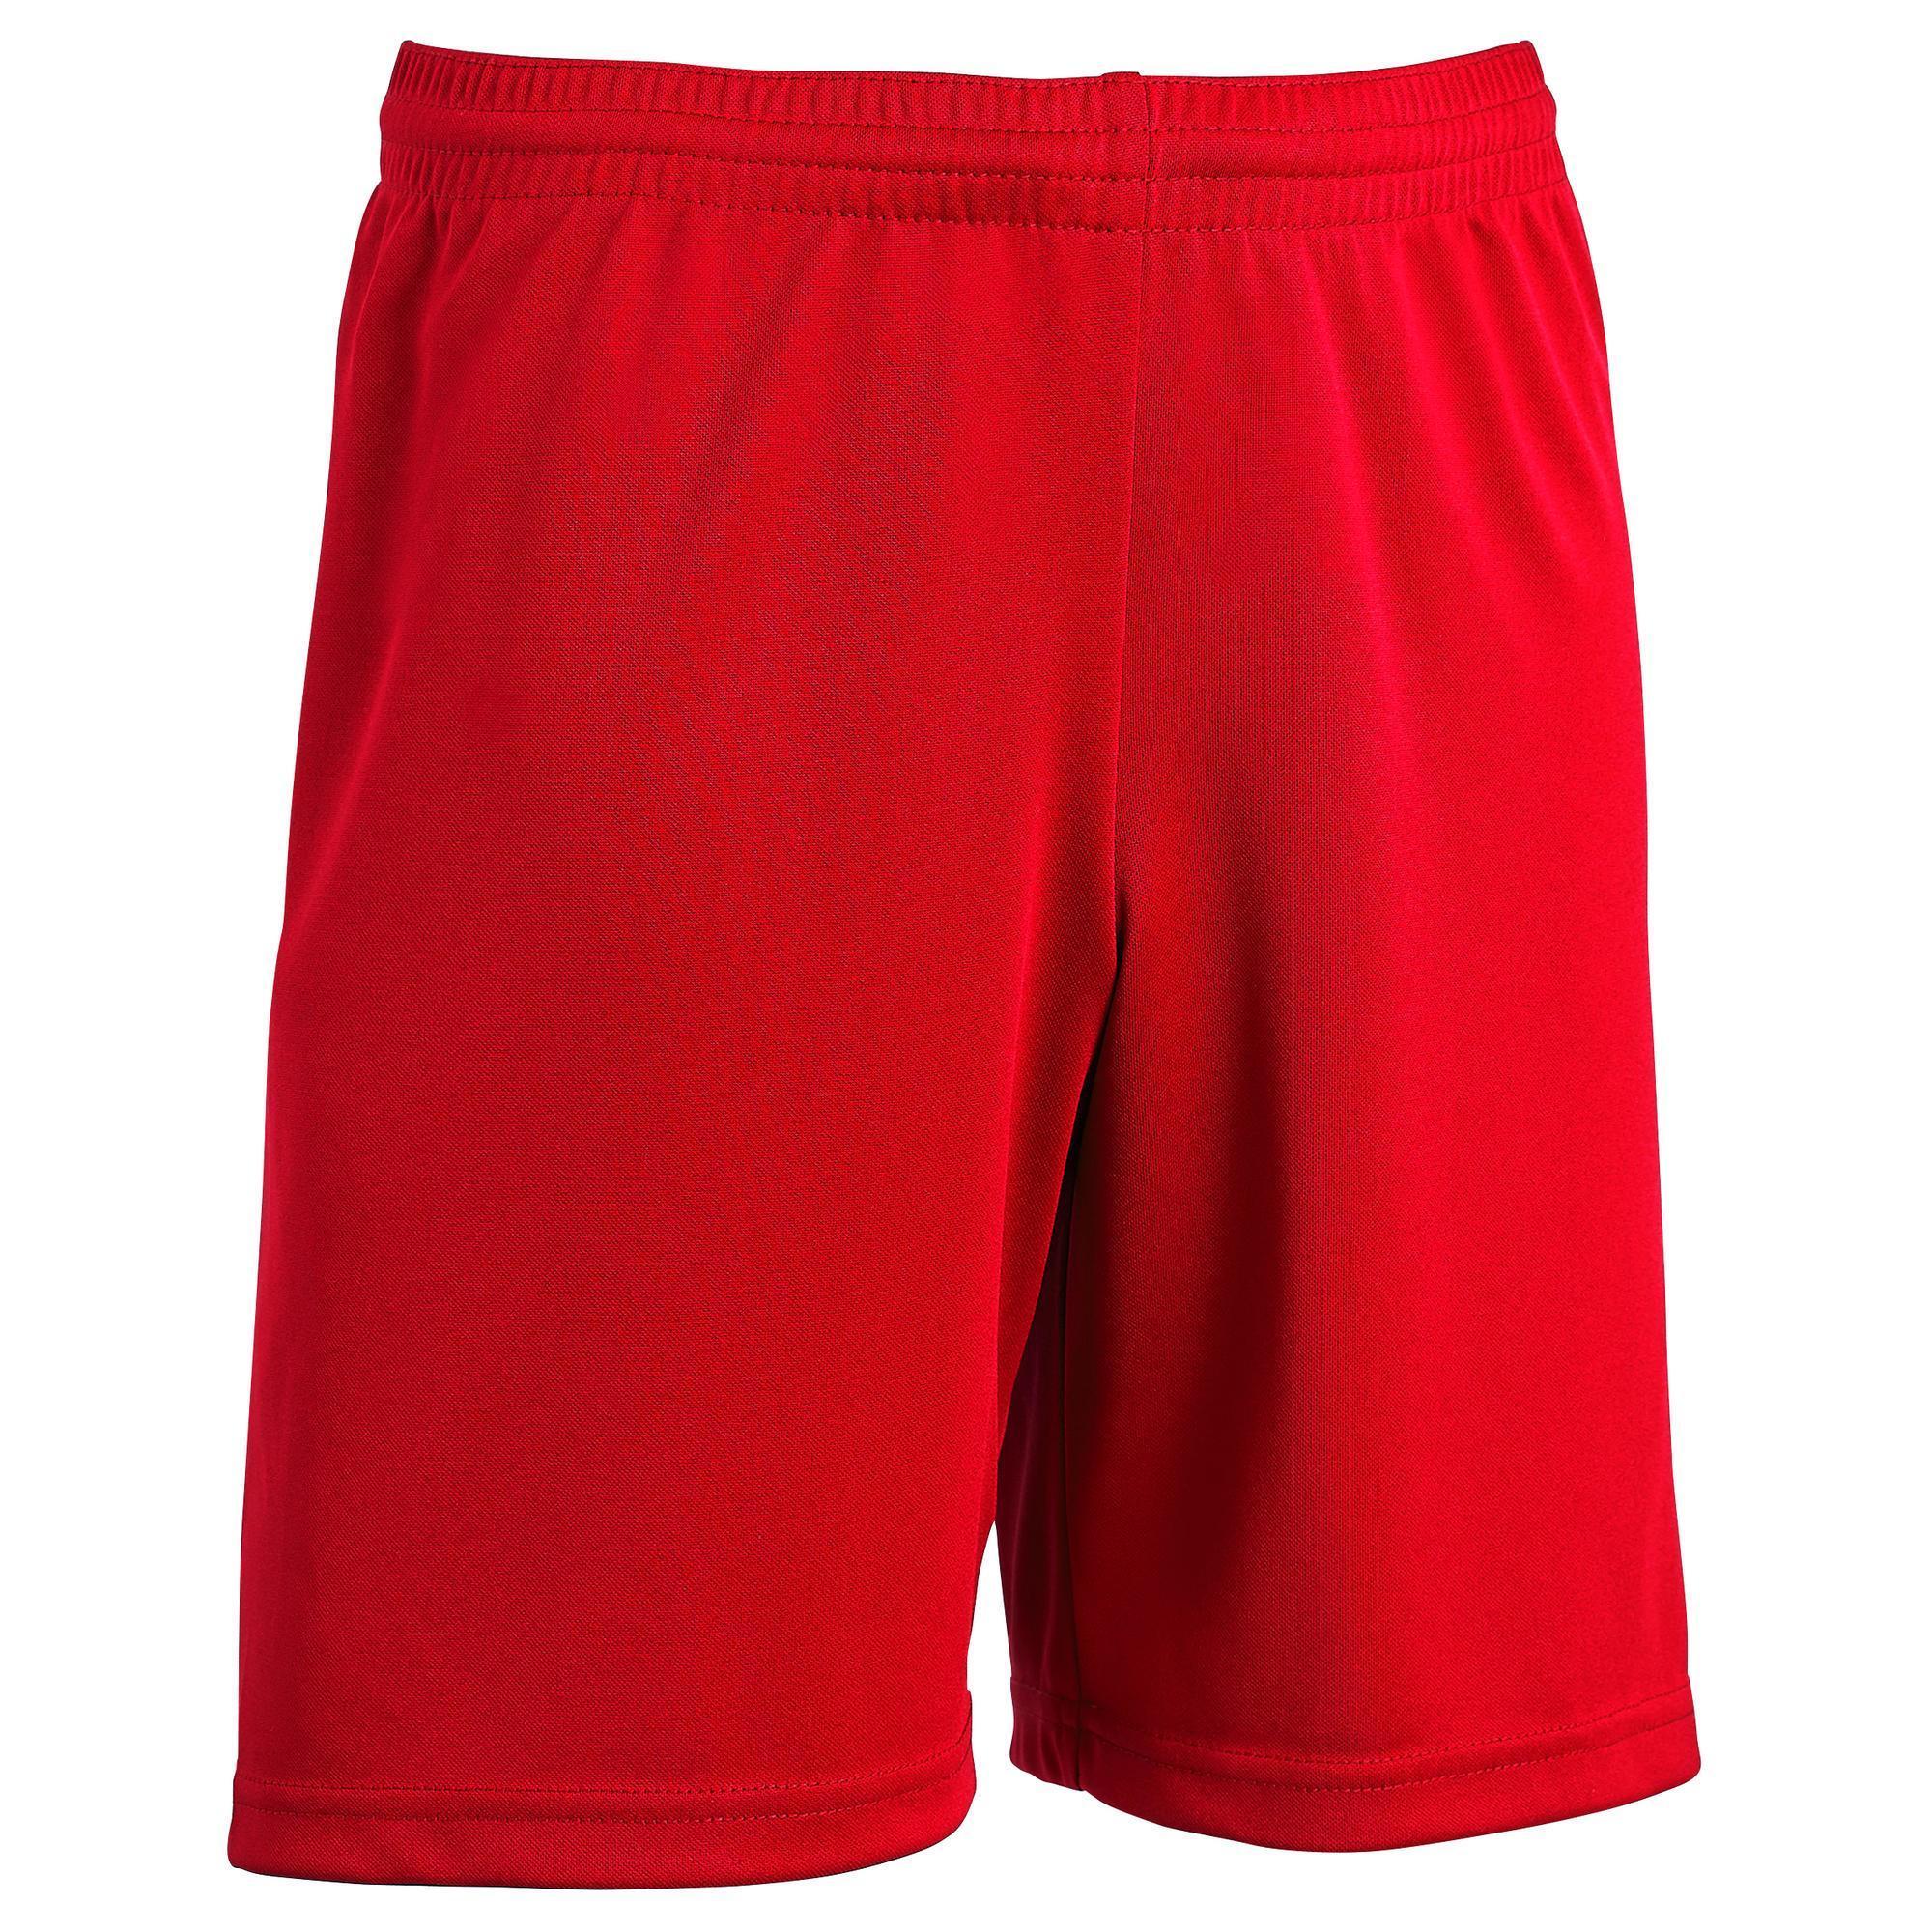 Kids' Football Shorts F100 - Black